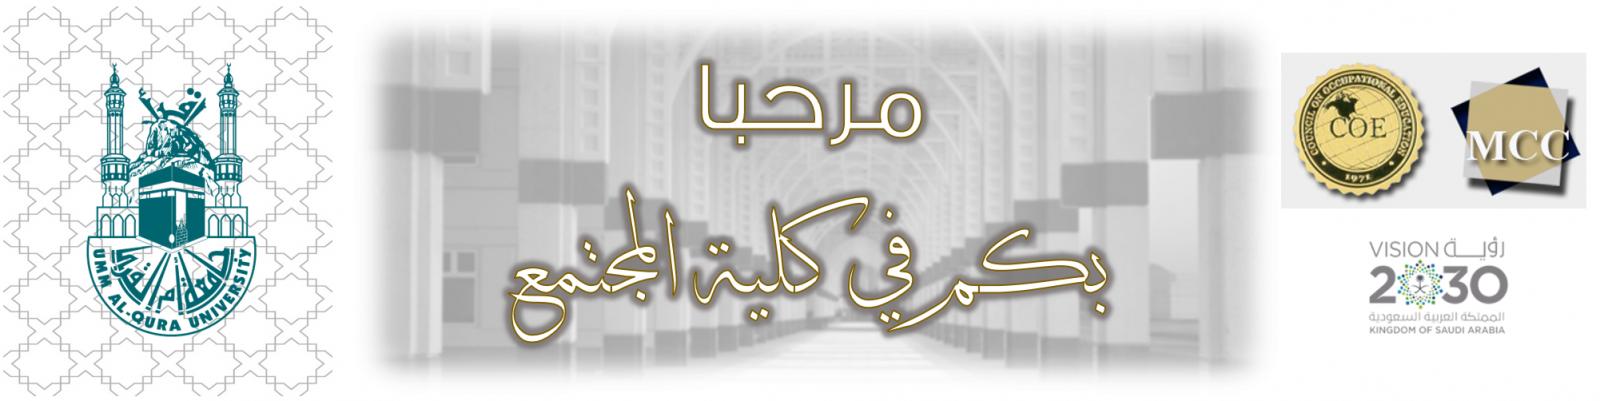 Makkah Community College   Umm Al-Qura University